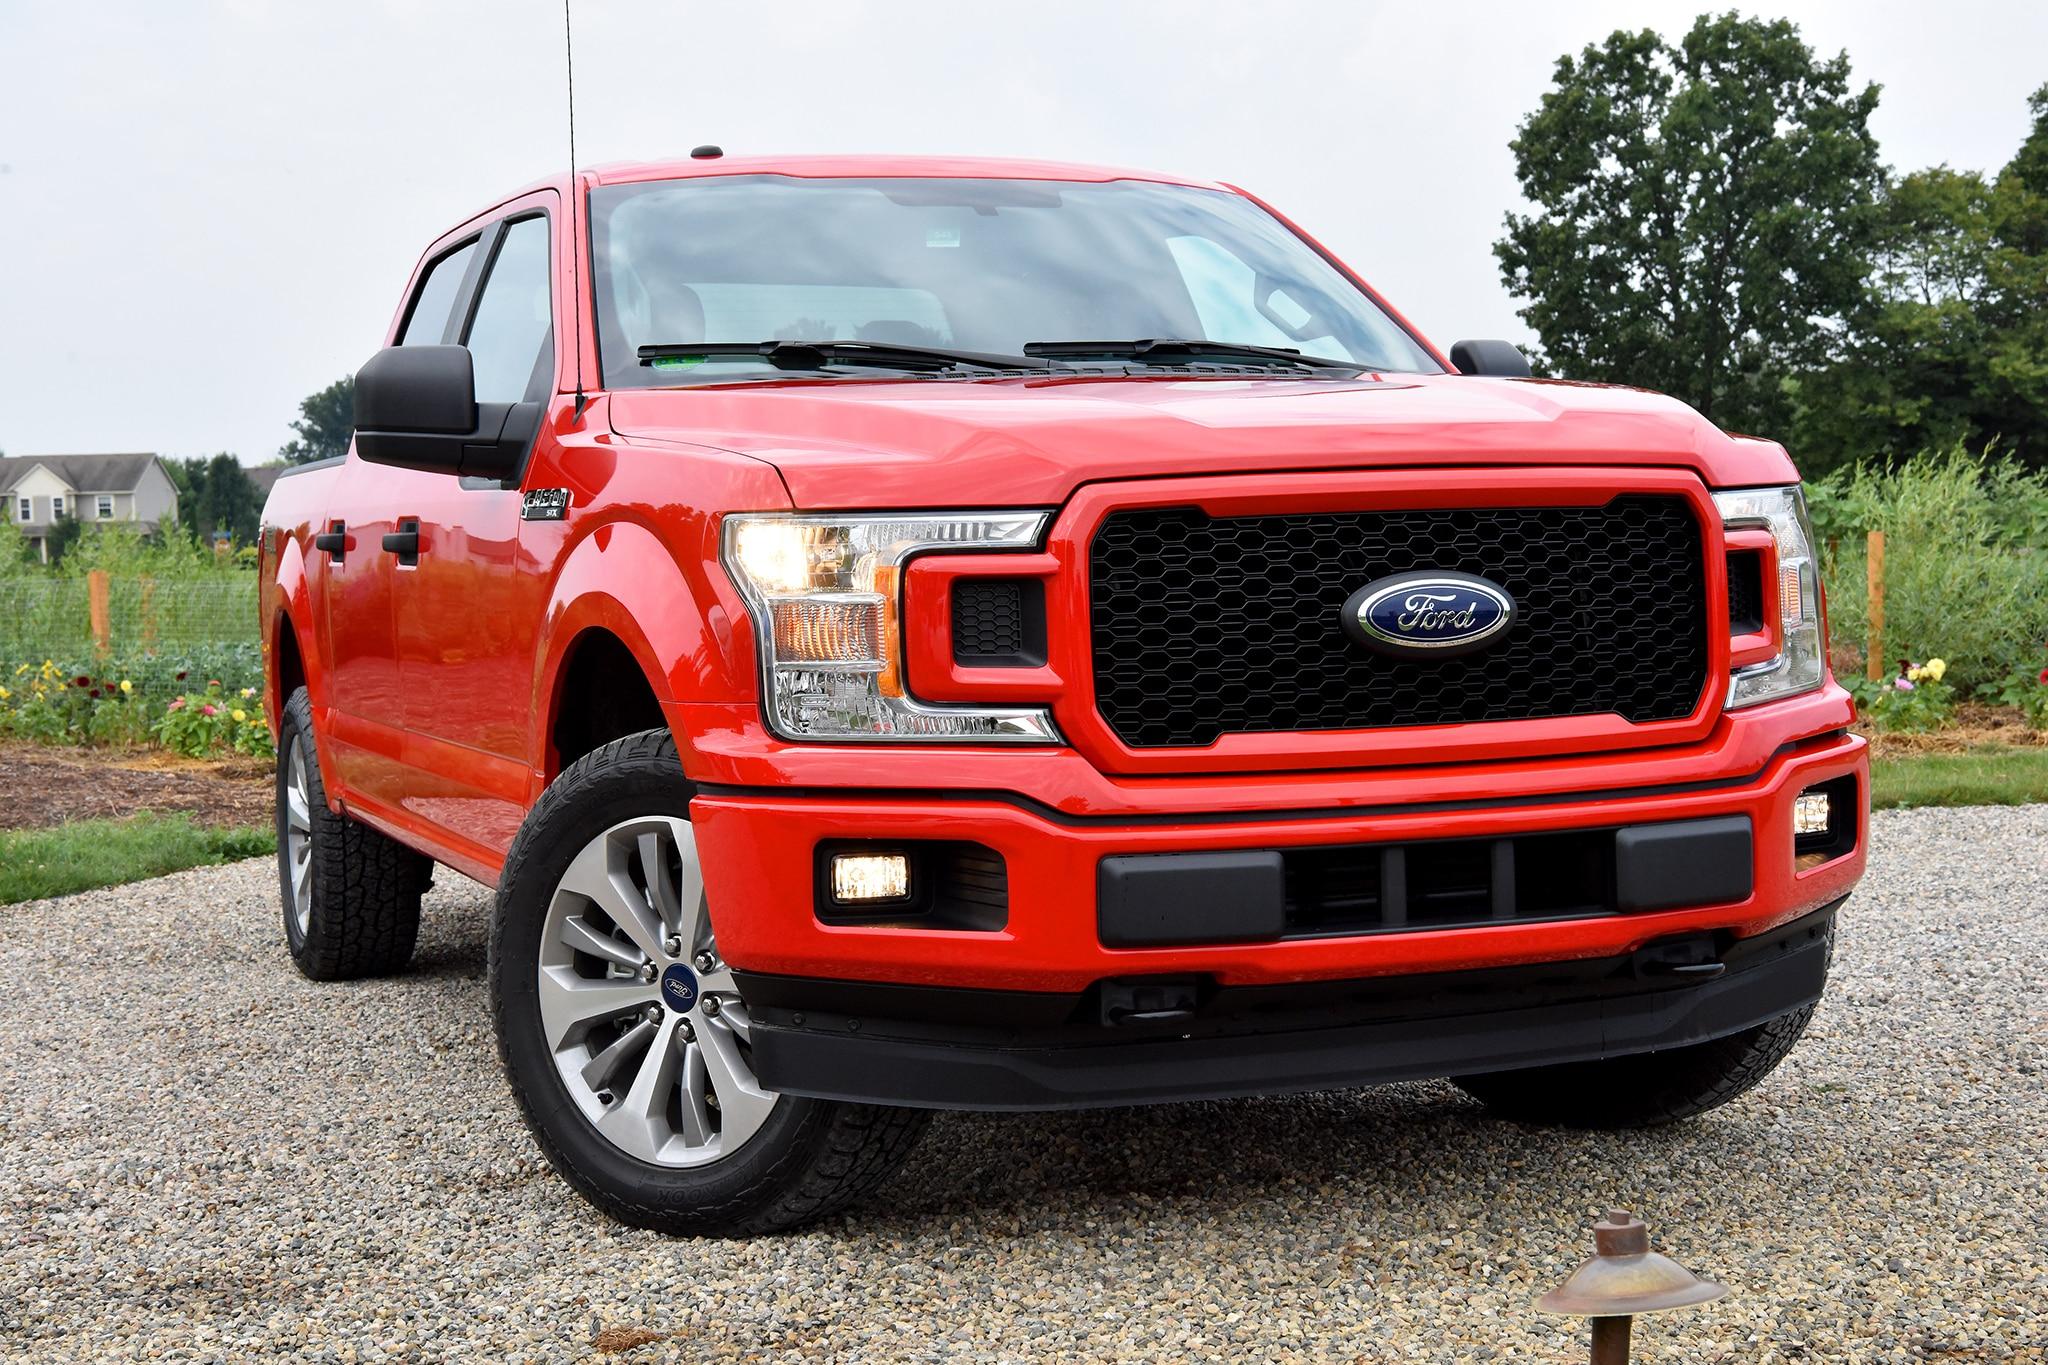 Ford Dealership Builds F-150 Lightning That FoMoCo Won't   Automobile Magazine